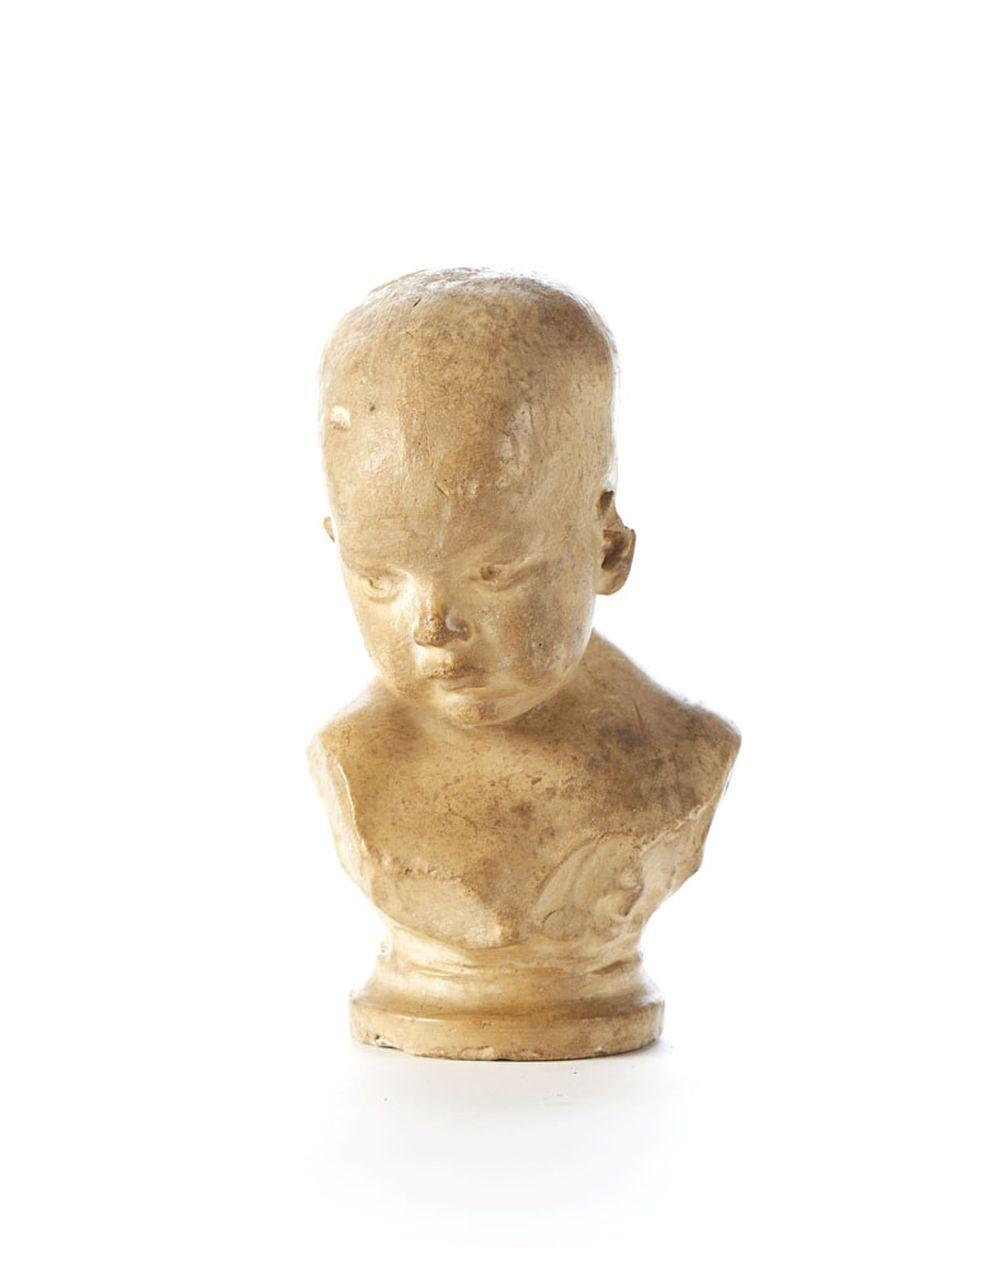 TEIXEIRA LOPES, Busto de bebé, Esc. em barro